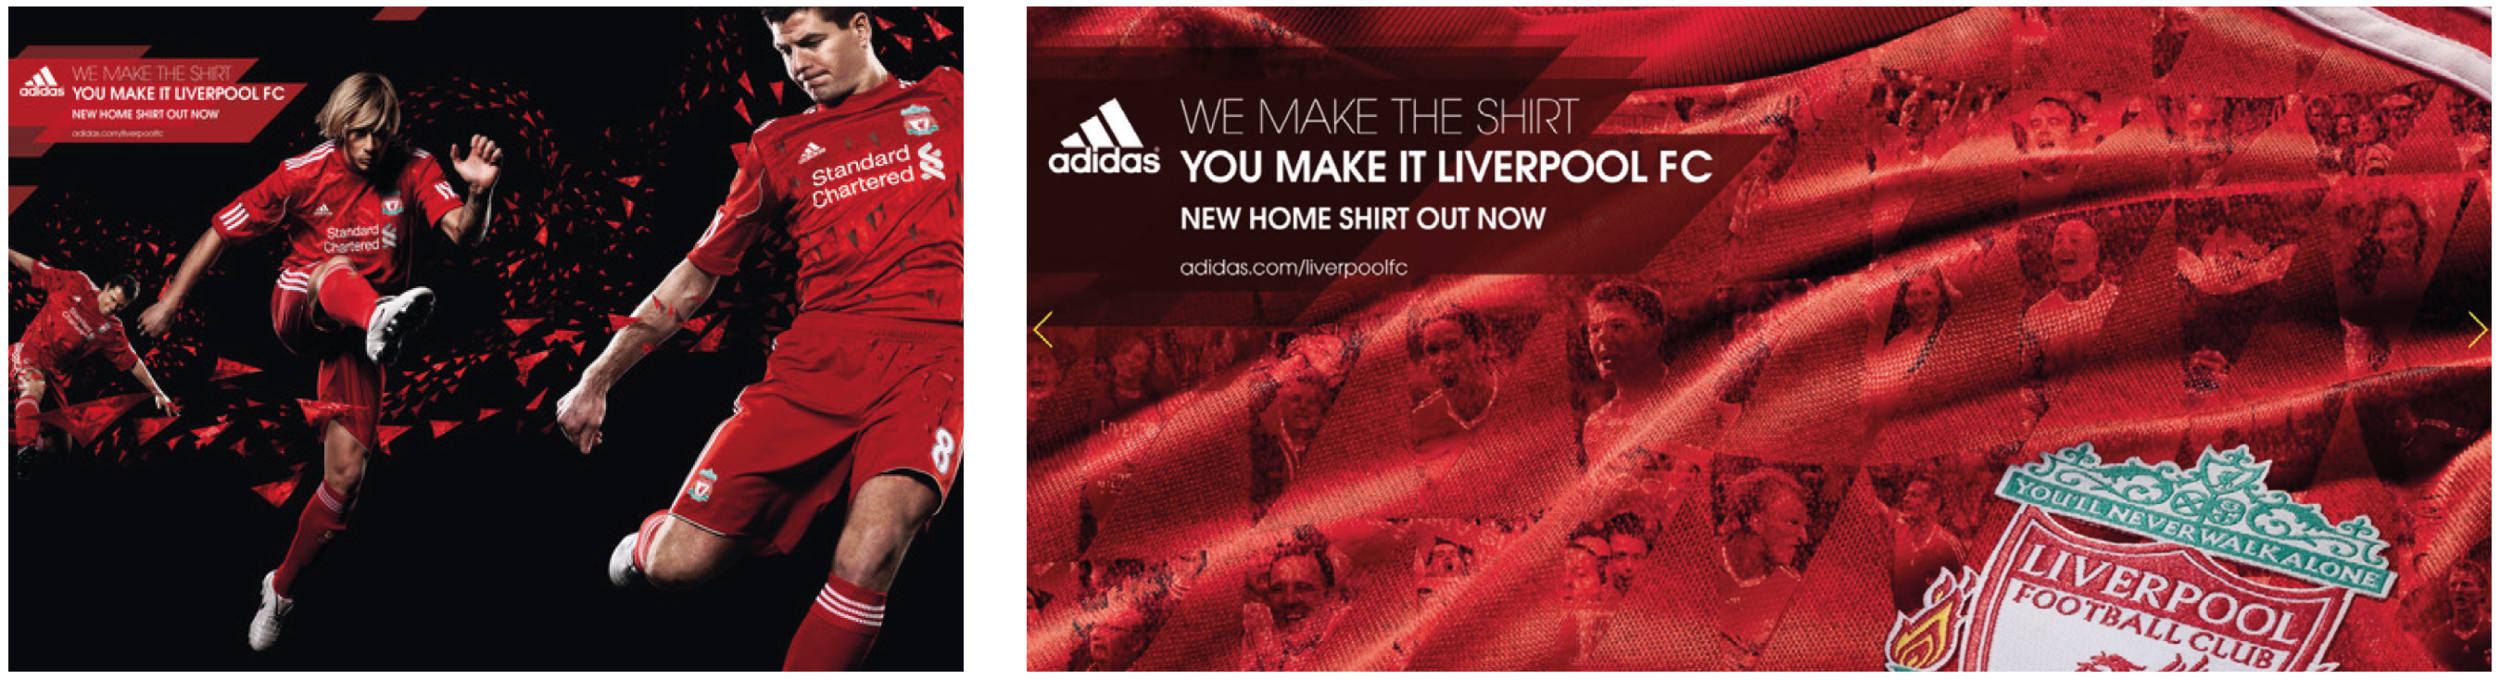 Adidas Liverpool FC